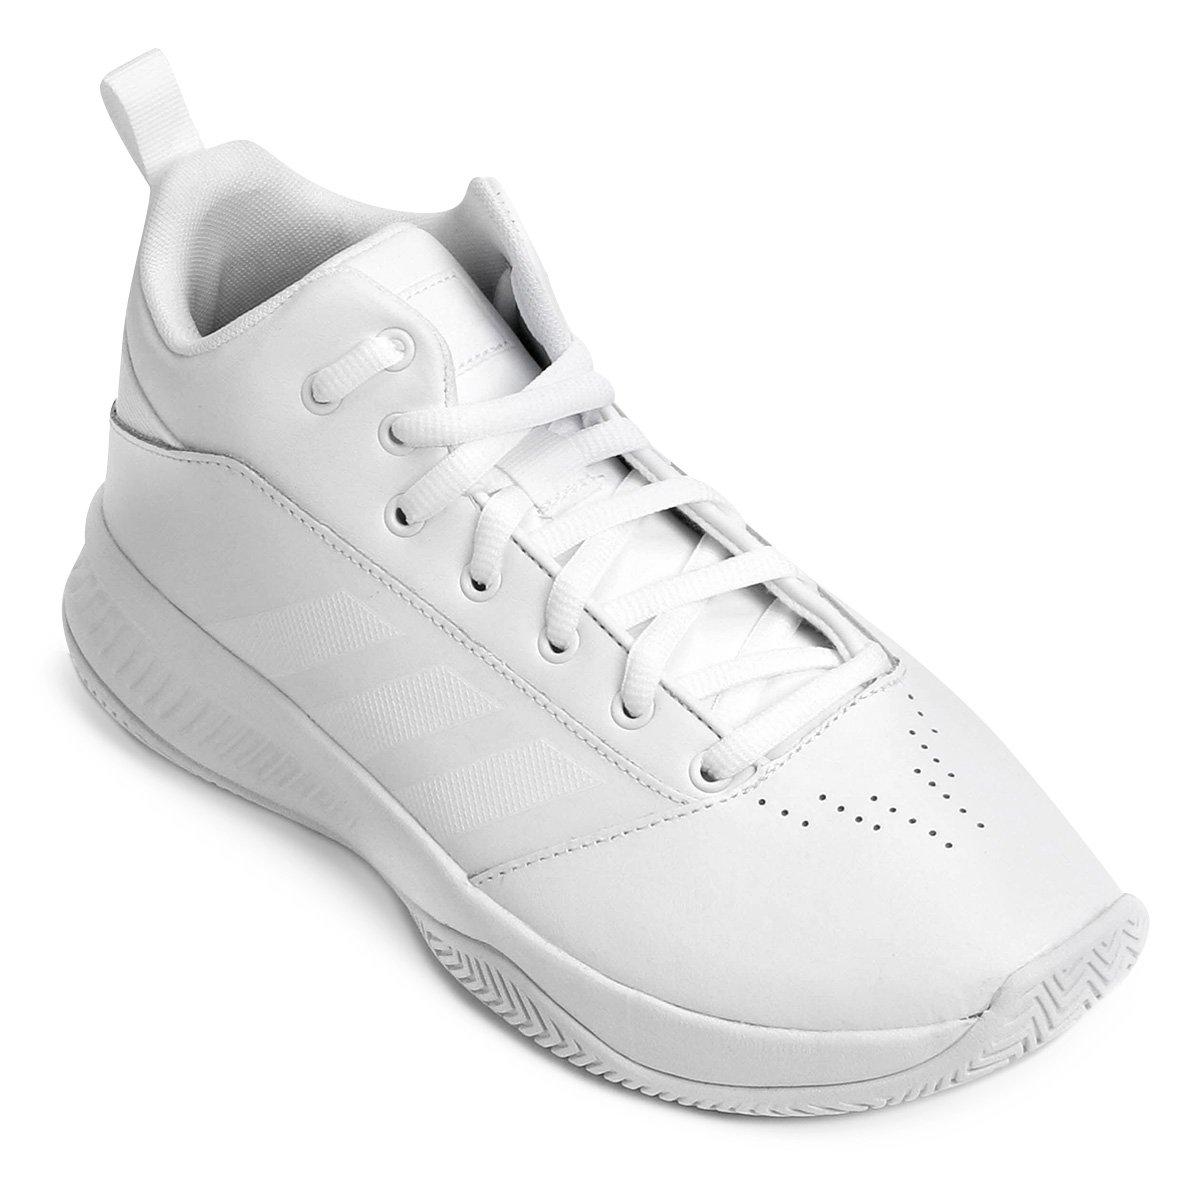 d174ebfff4 Tênis Adidas CF Ilation 2 Masculino - Compre Agora